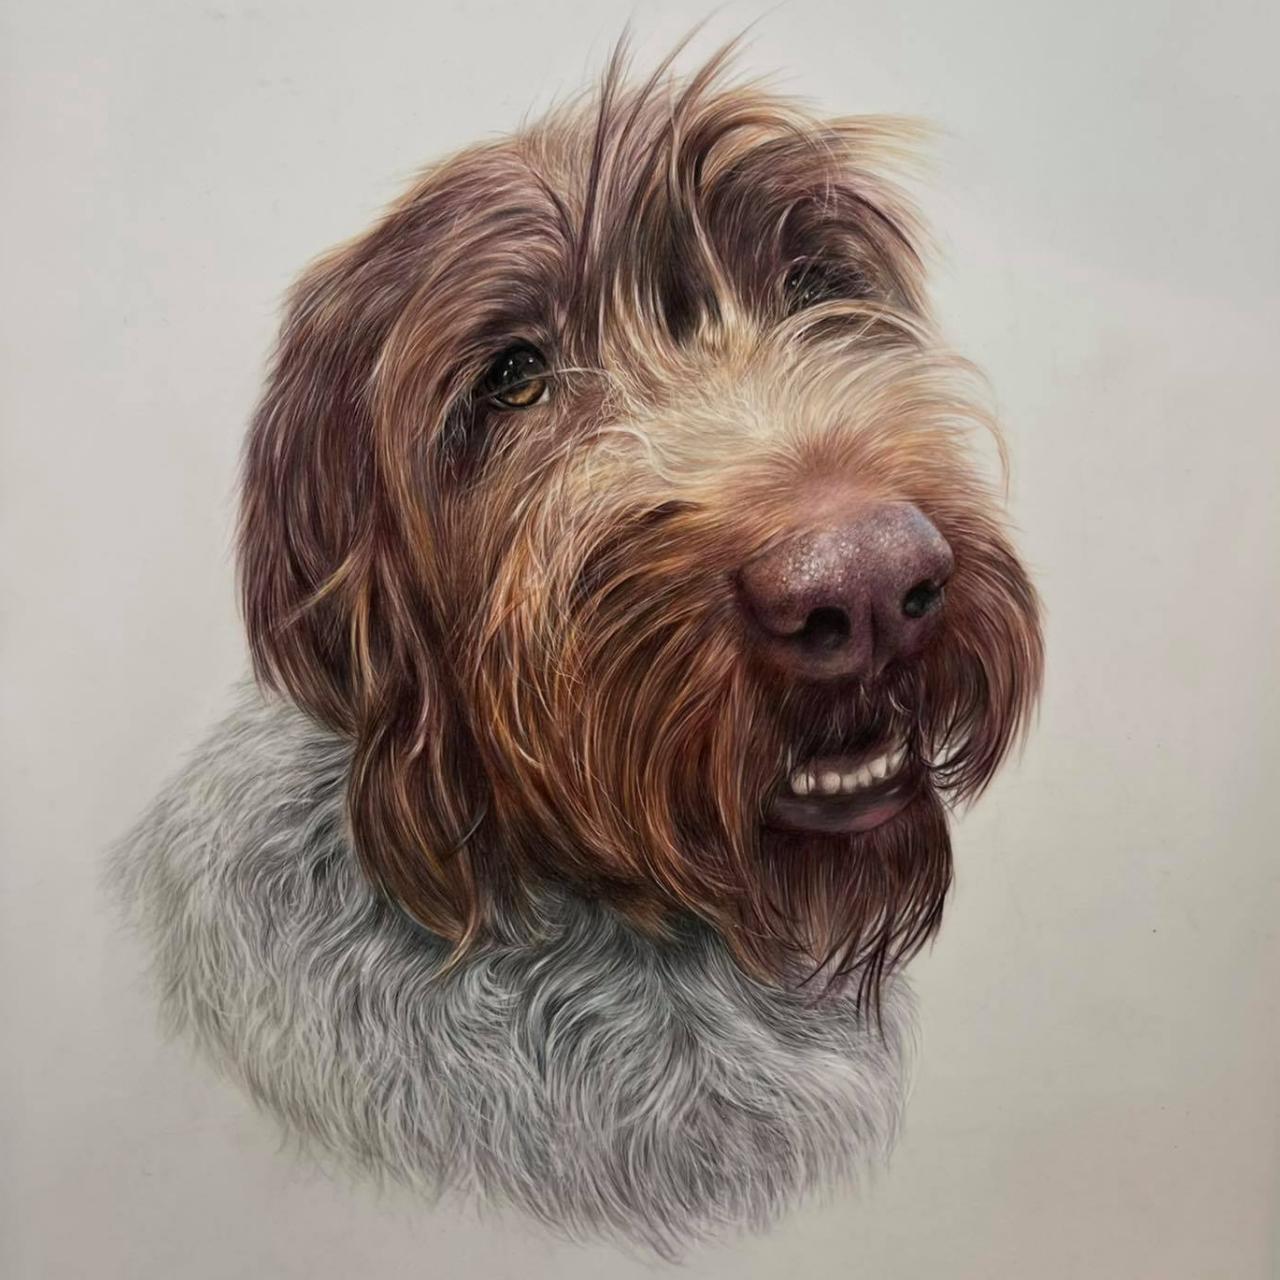 Shaggy Dog - Coloured Pencil Drawing - Bonny Snowdon Fine Art